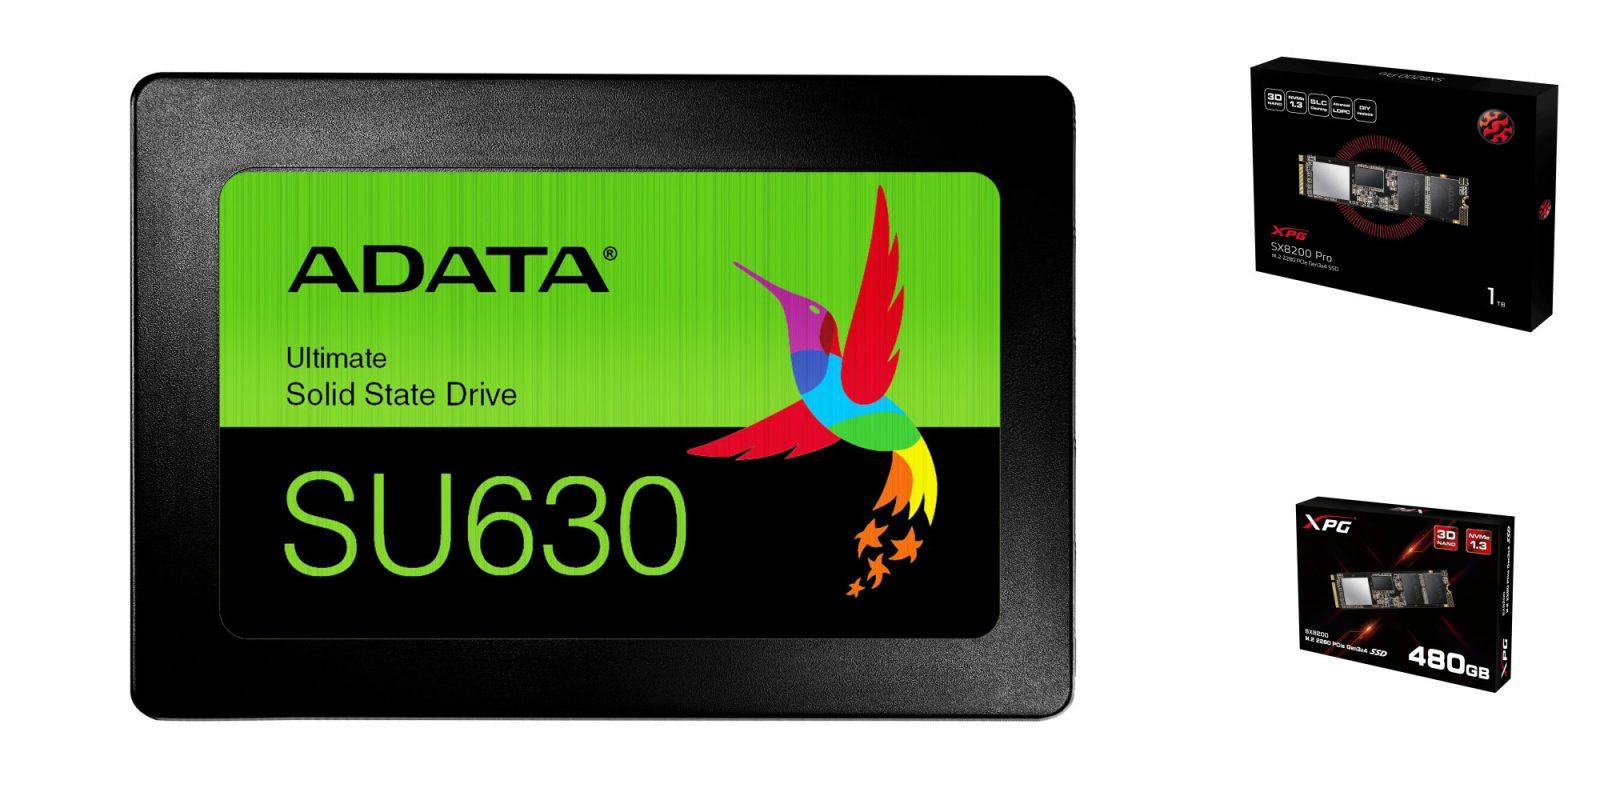 SSD Sale: ADATA 960GB 2 5-inch $75 (Save $15), XPG 1TB NVMe $127 50